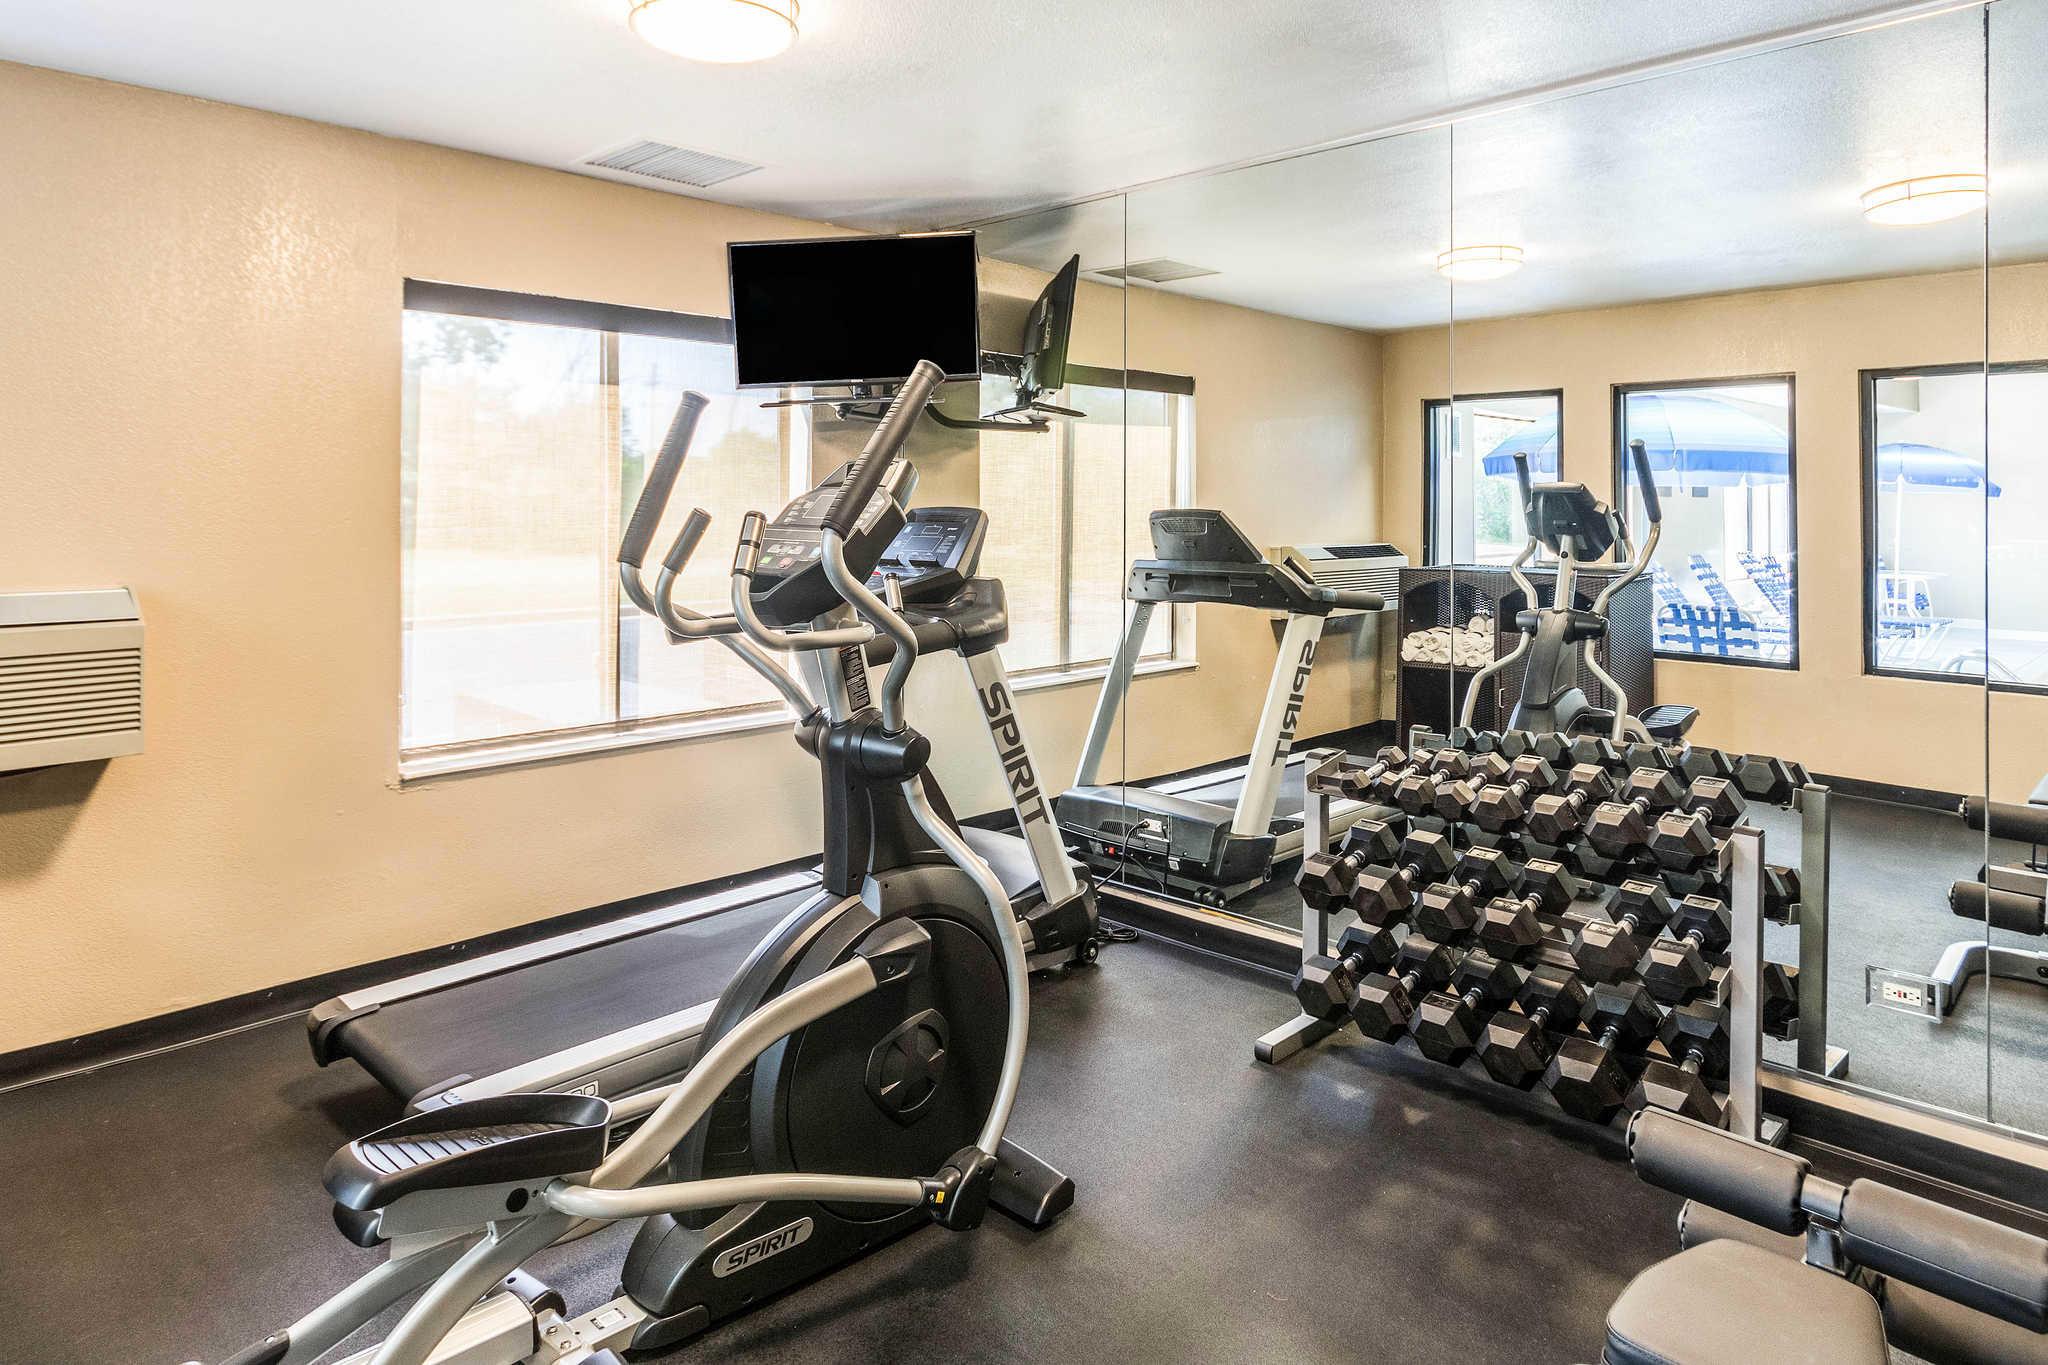 Comfort Inn & Suites North Aurora - Naperville image 36